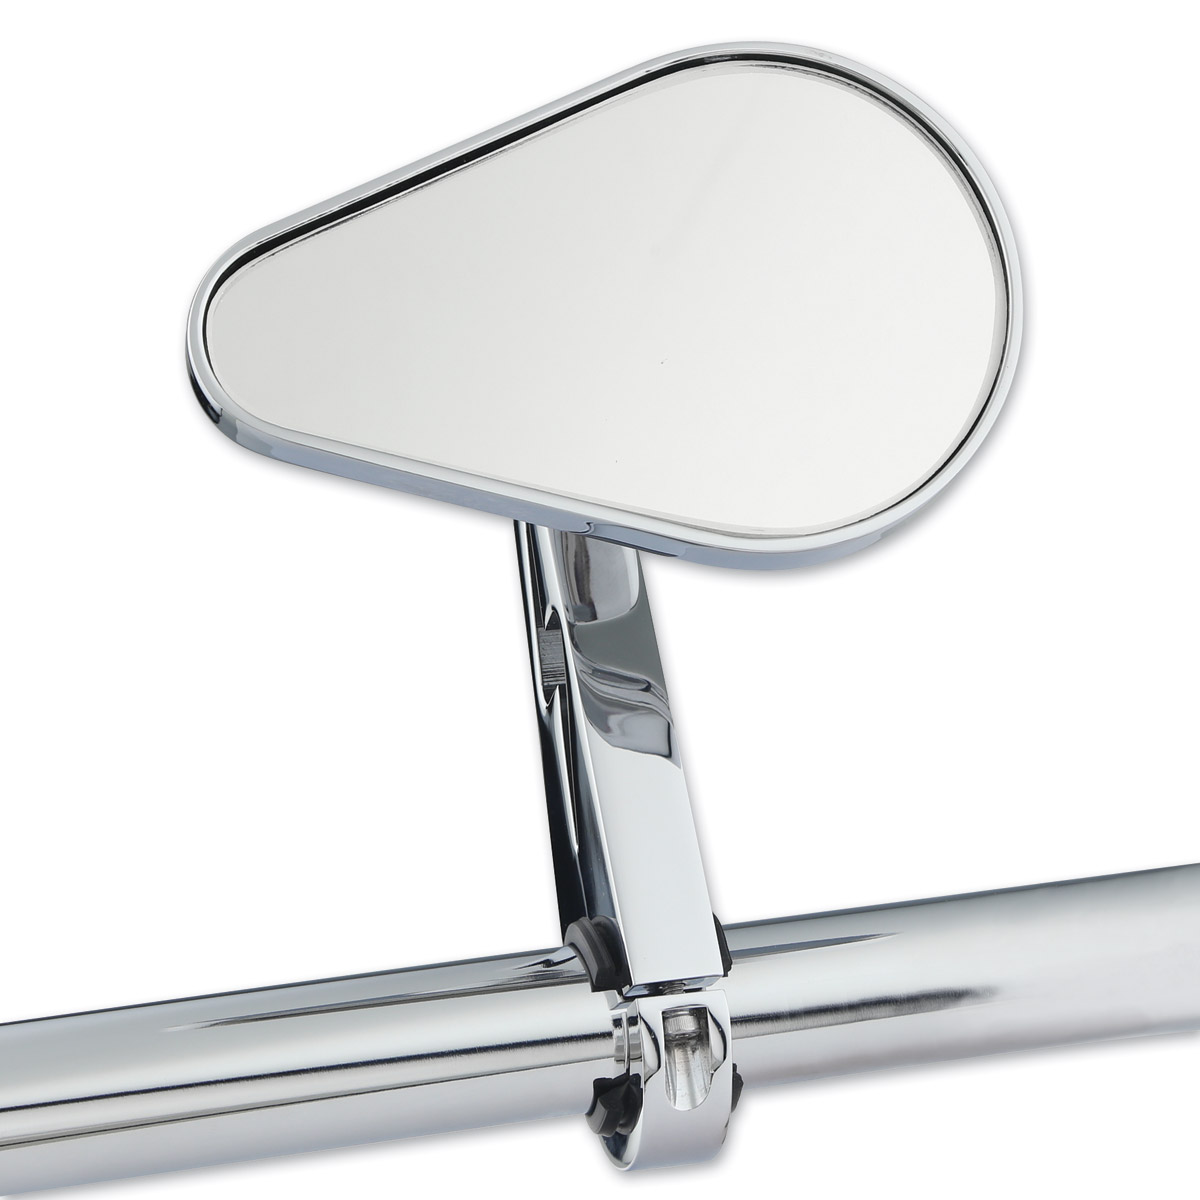 J&P Cycles® Clamp-On Teardrop Mirror